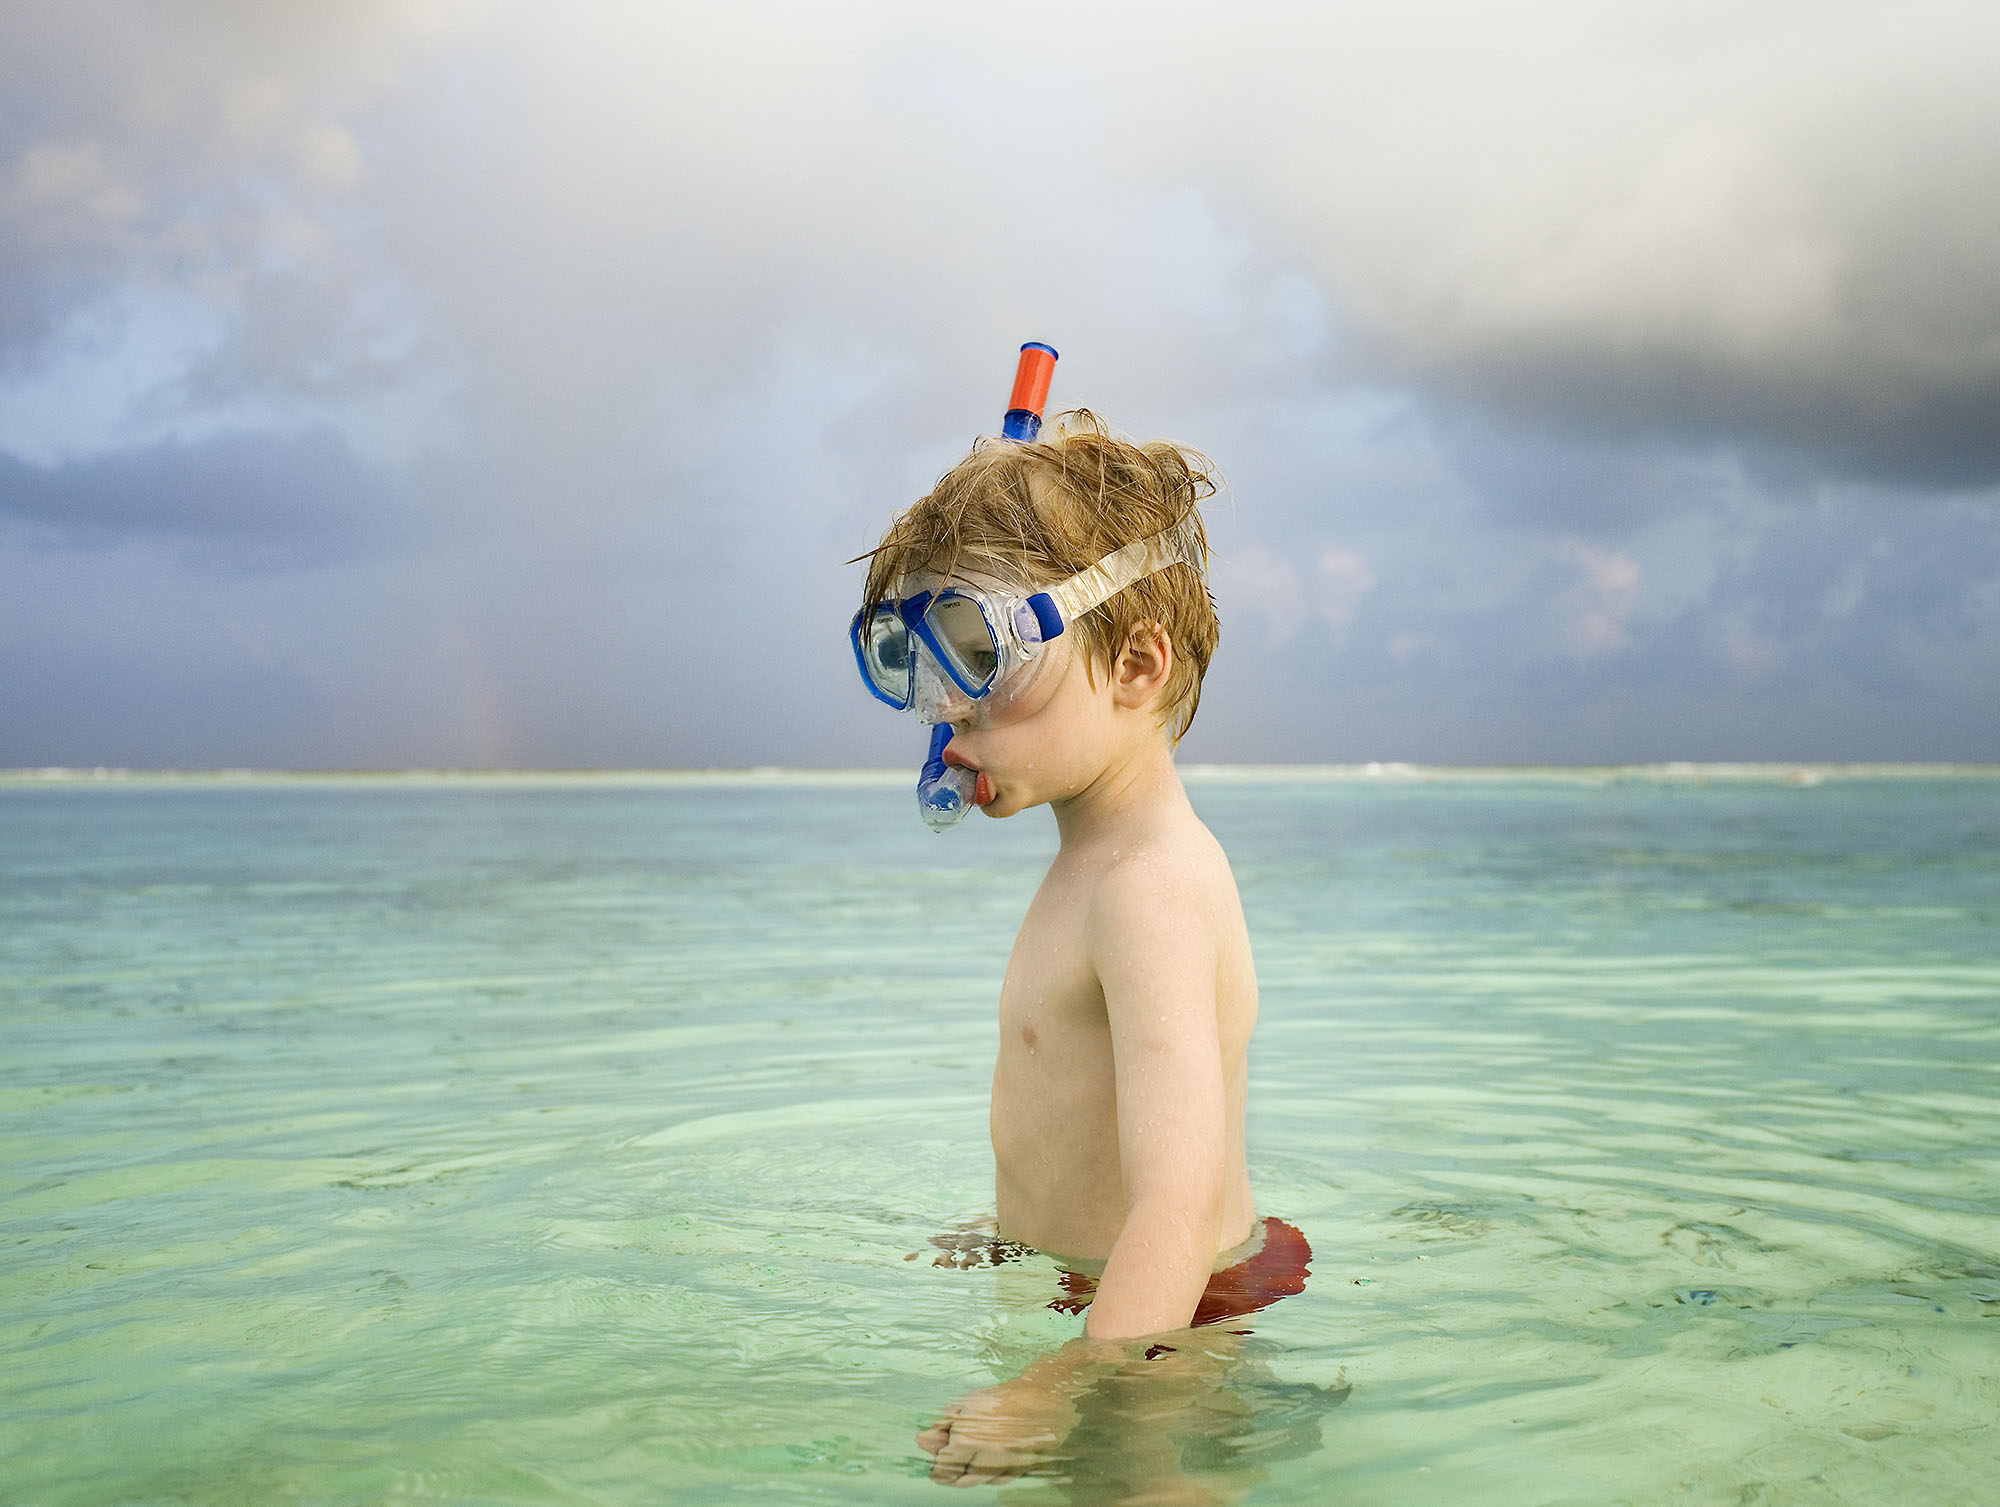 Karan Kapoor boy in sea with googles